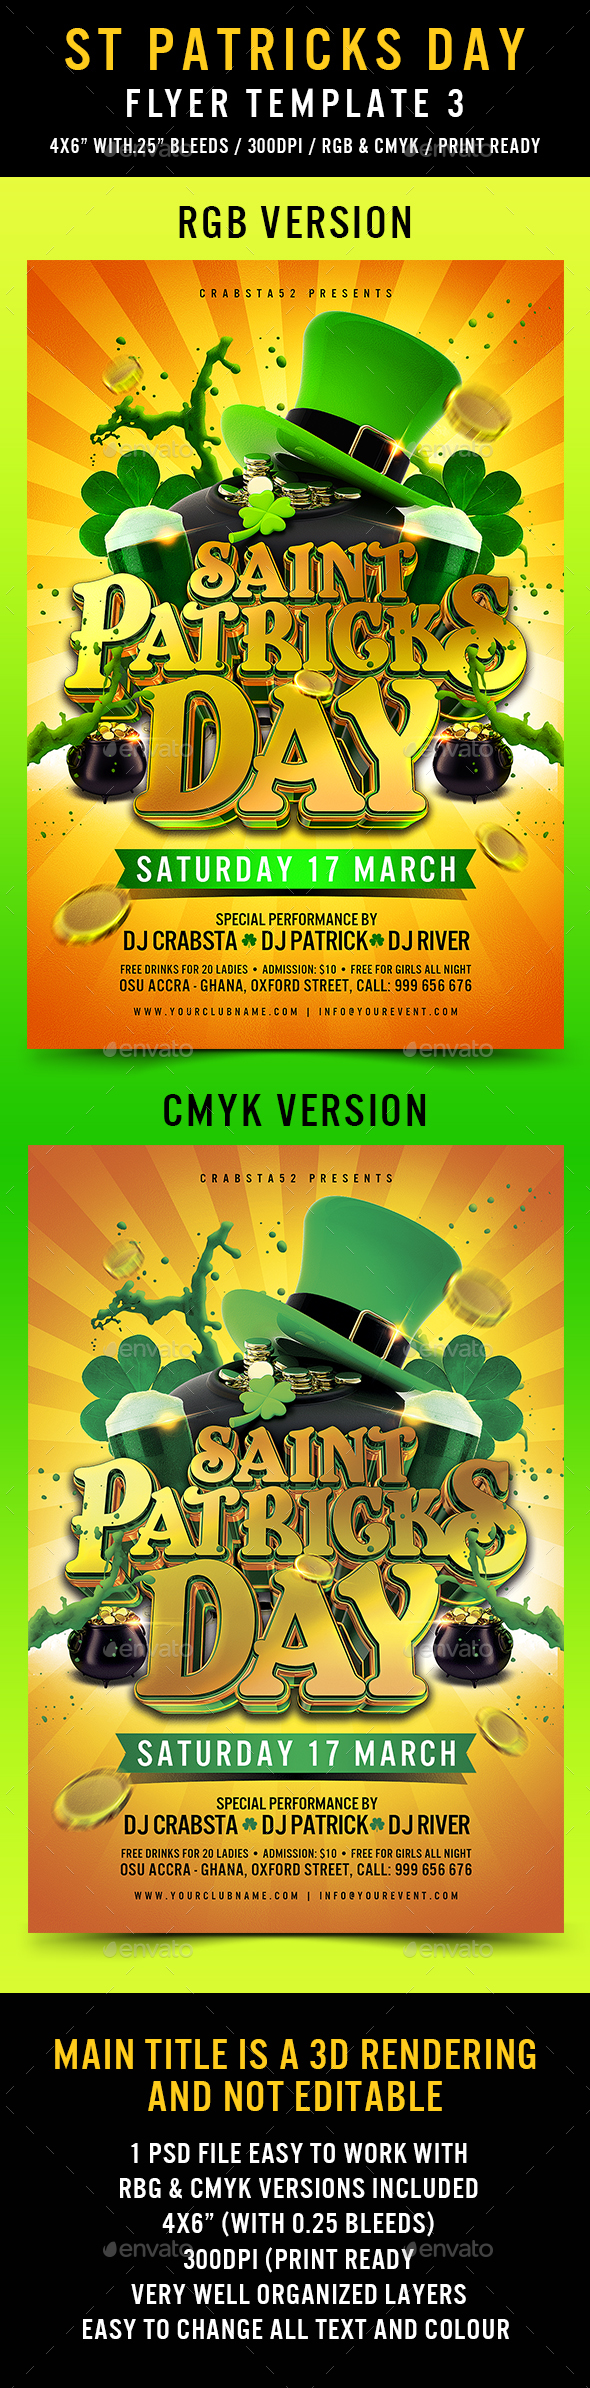 St Patricks Day Flyer Template 3 - Flyers Print Templates